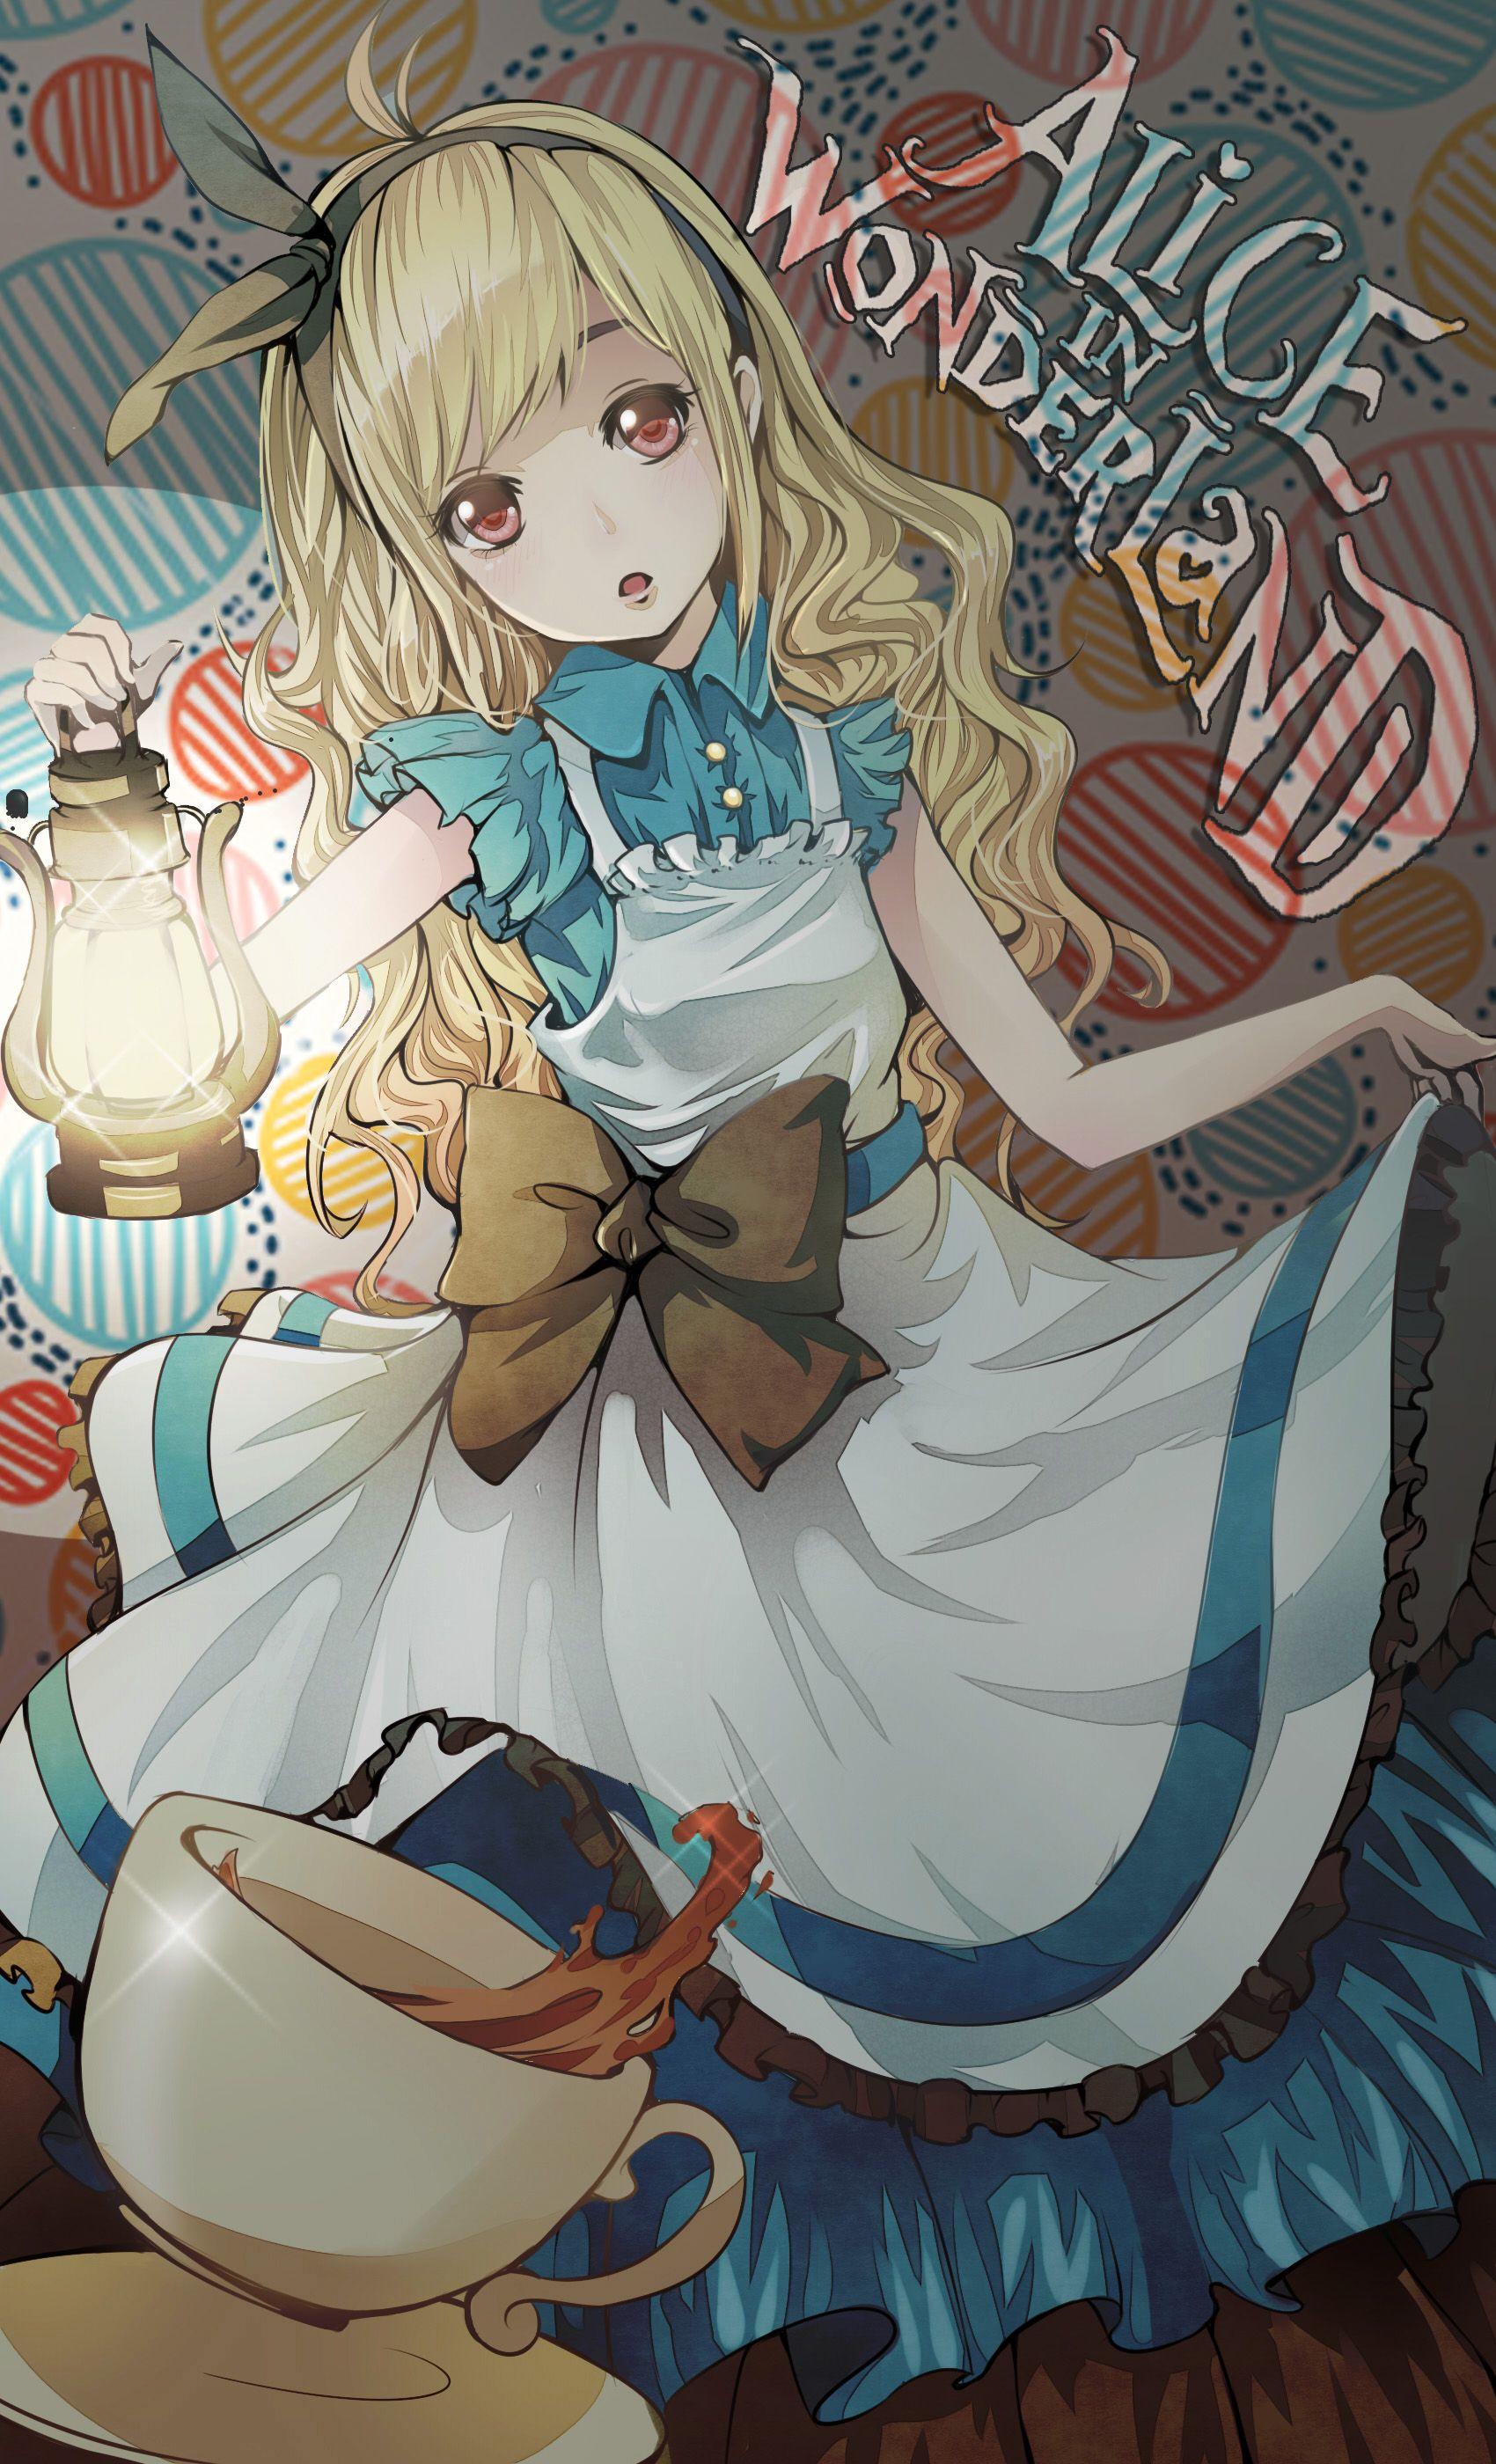 foto de Alice in Wonderland (With images) Alice in wonderland